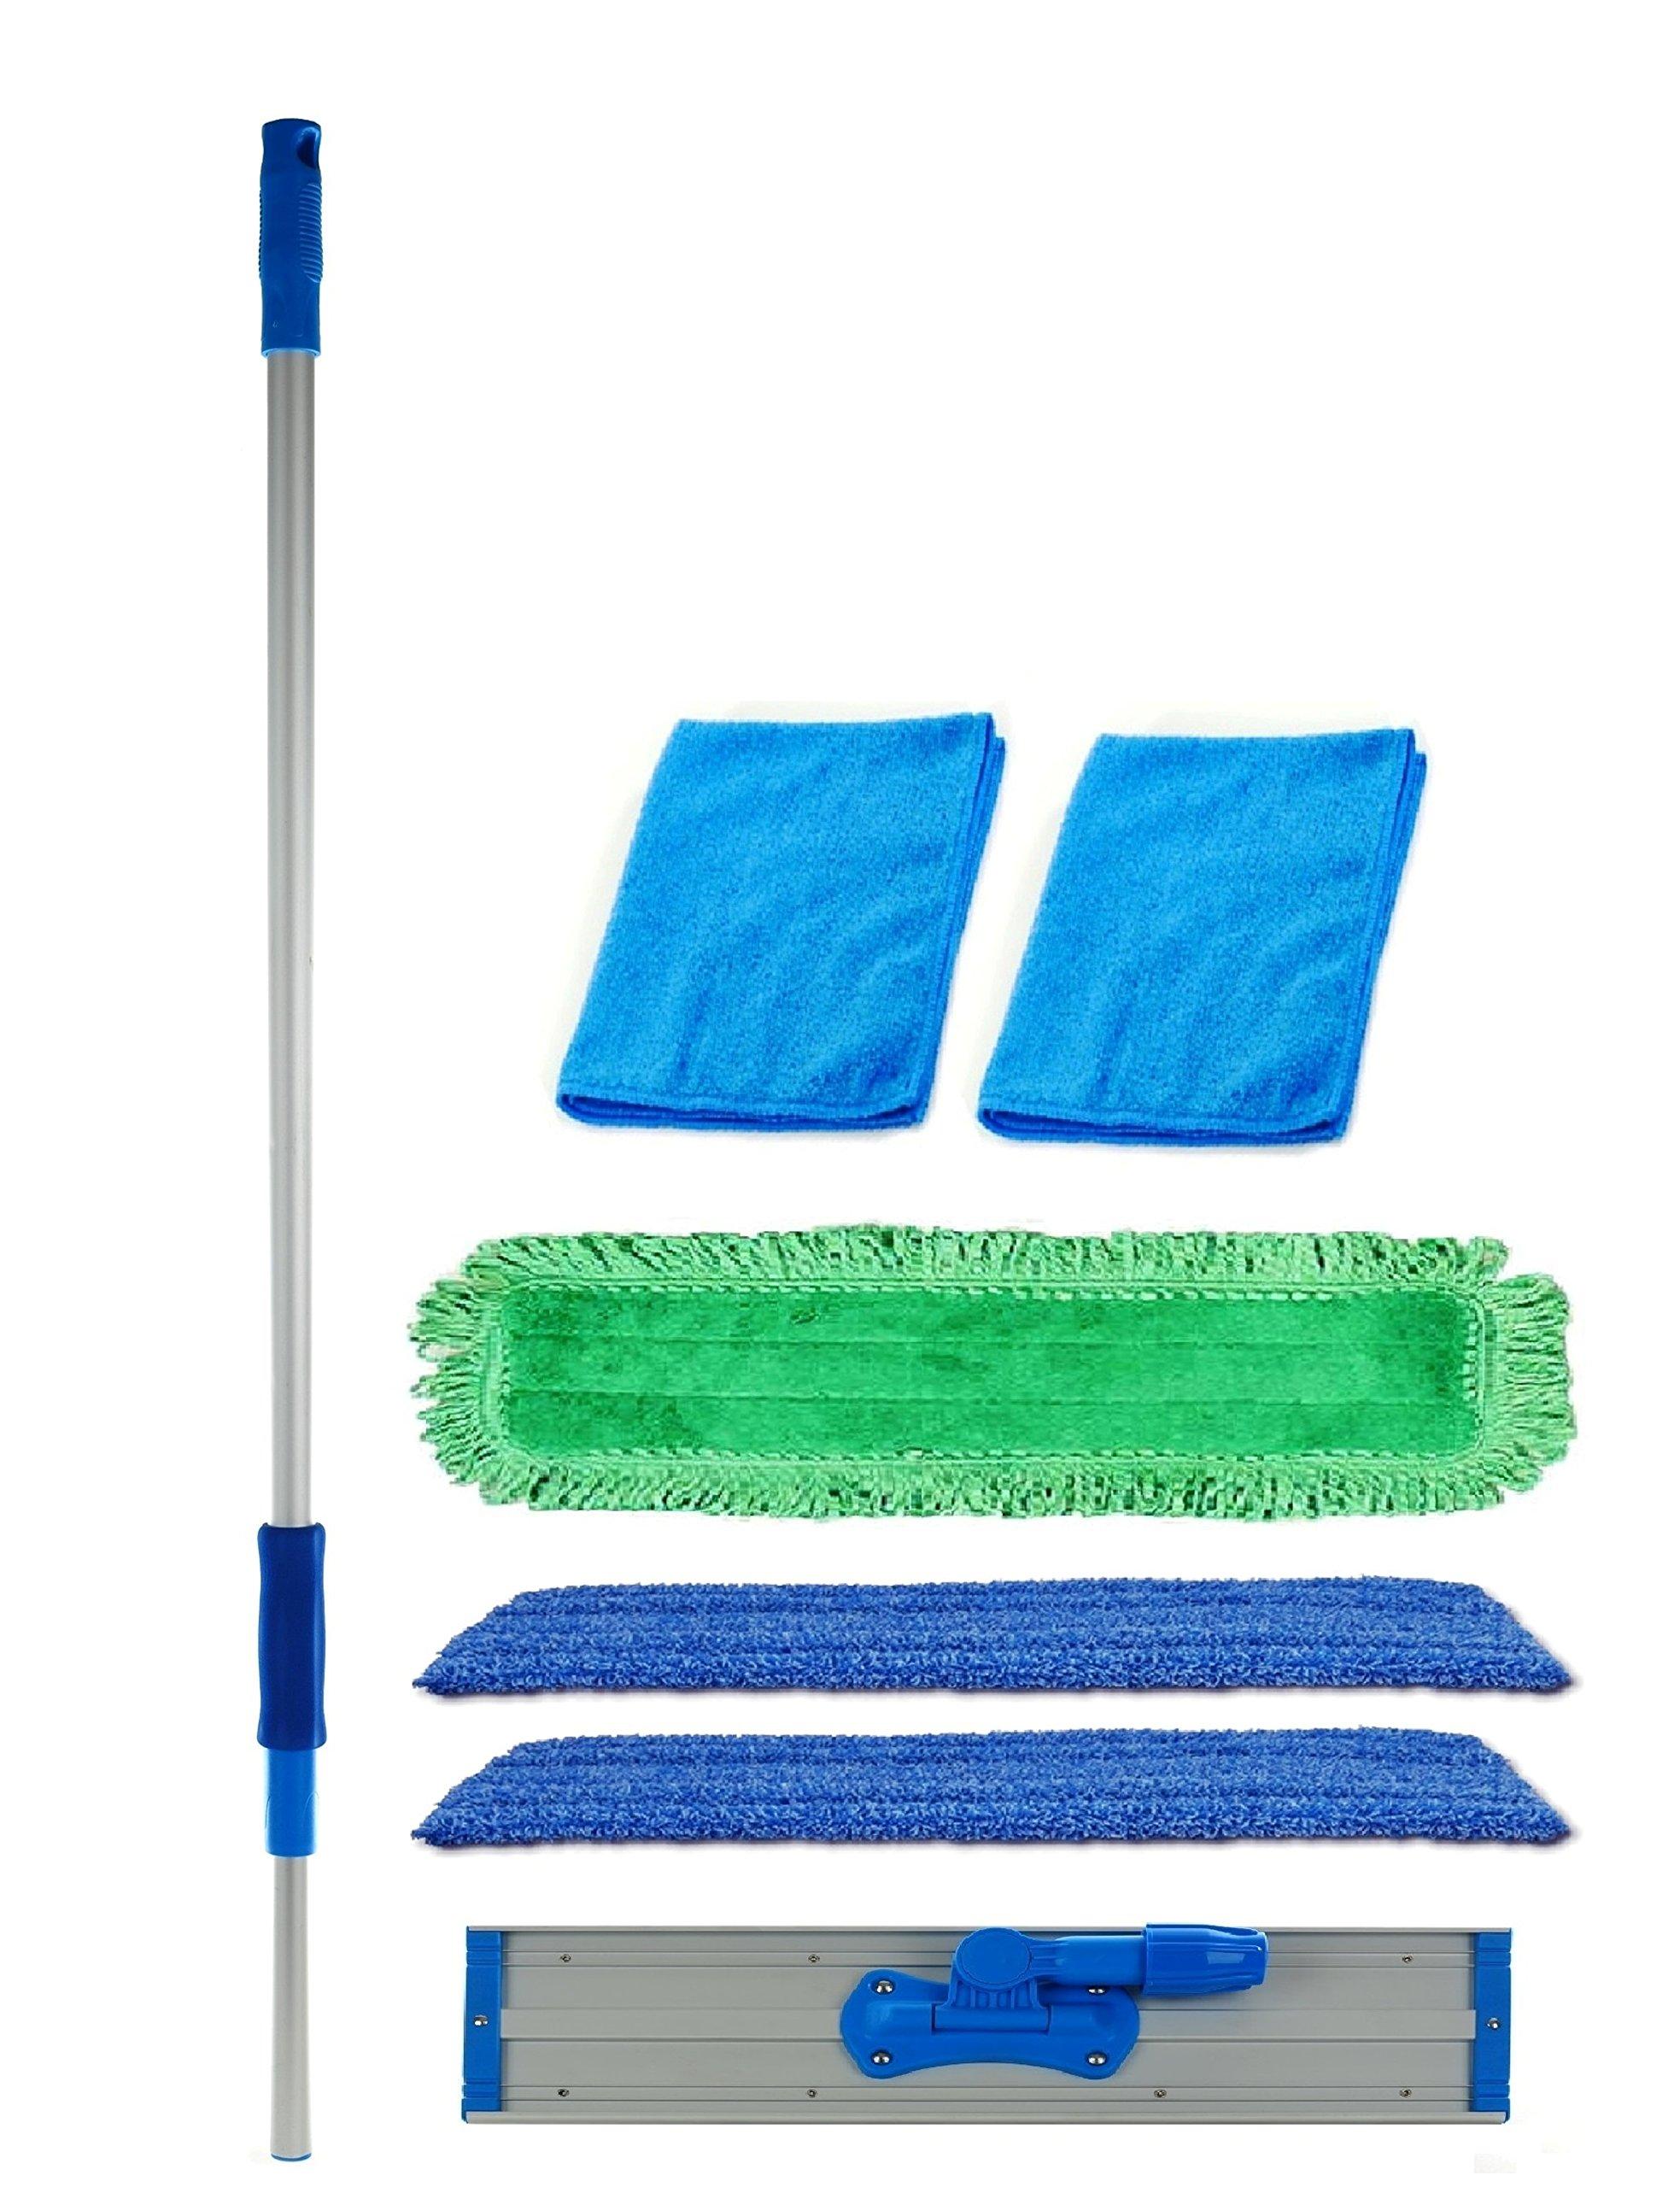 Real Clean 24 inch Professional Commercial Microfiber Mop With Three 24'' Premium Microfiber Mop Pads and 2 Bonus Microfiber Towels